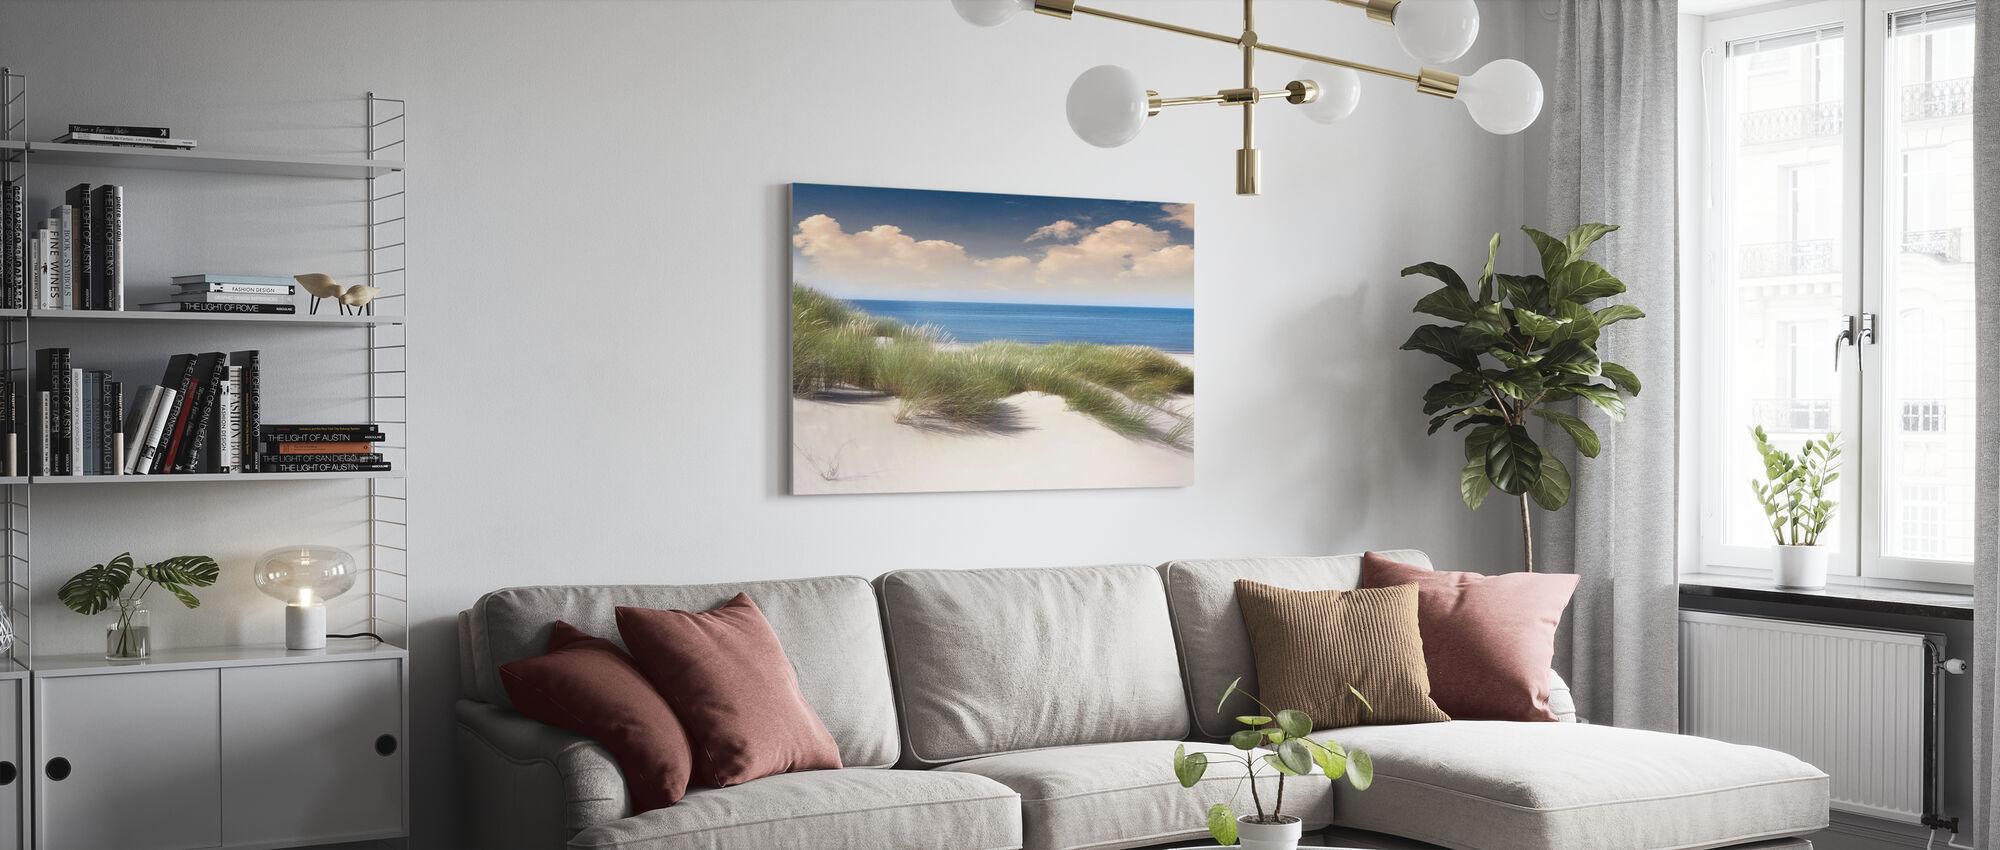 Grasrijke zandduinen - Canvas print - Woonkamer